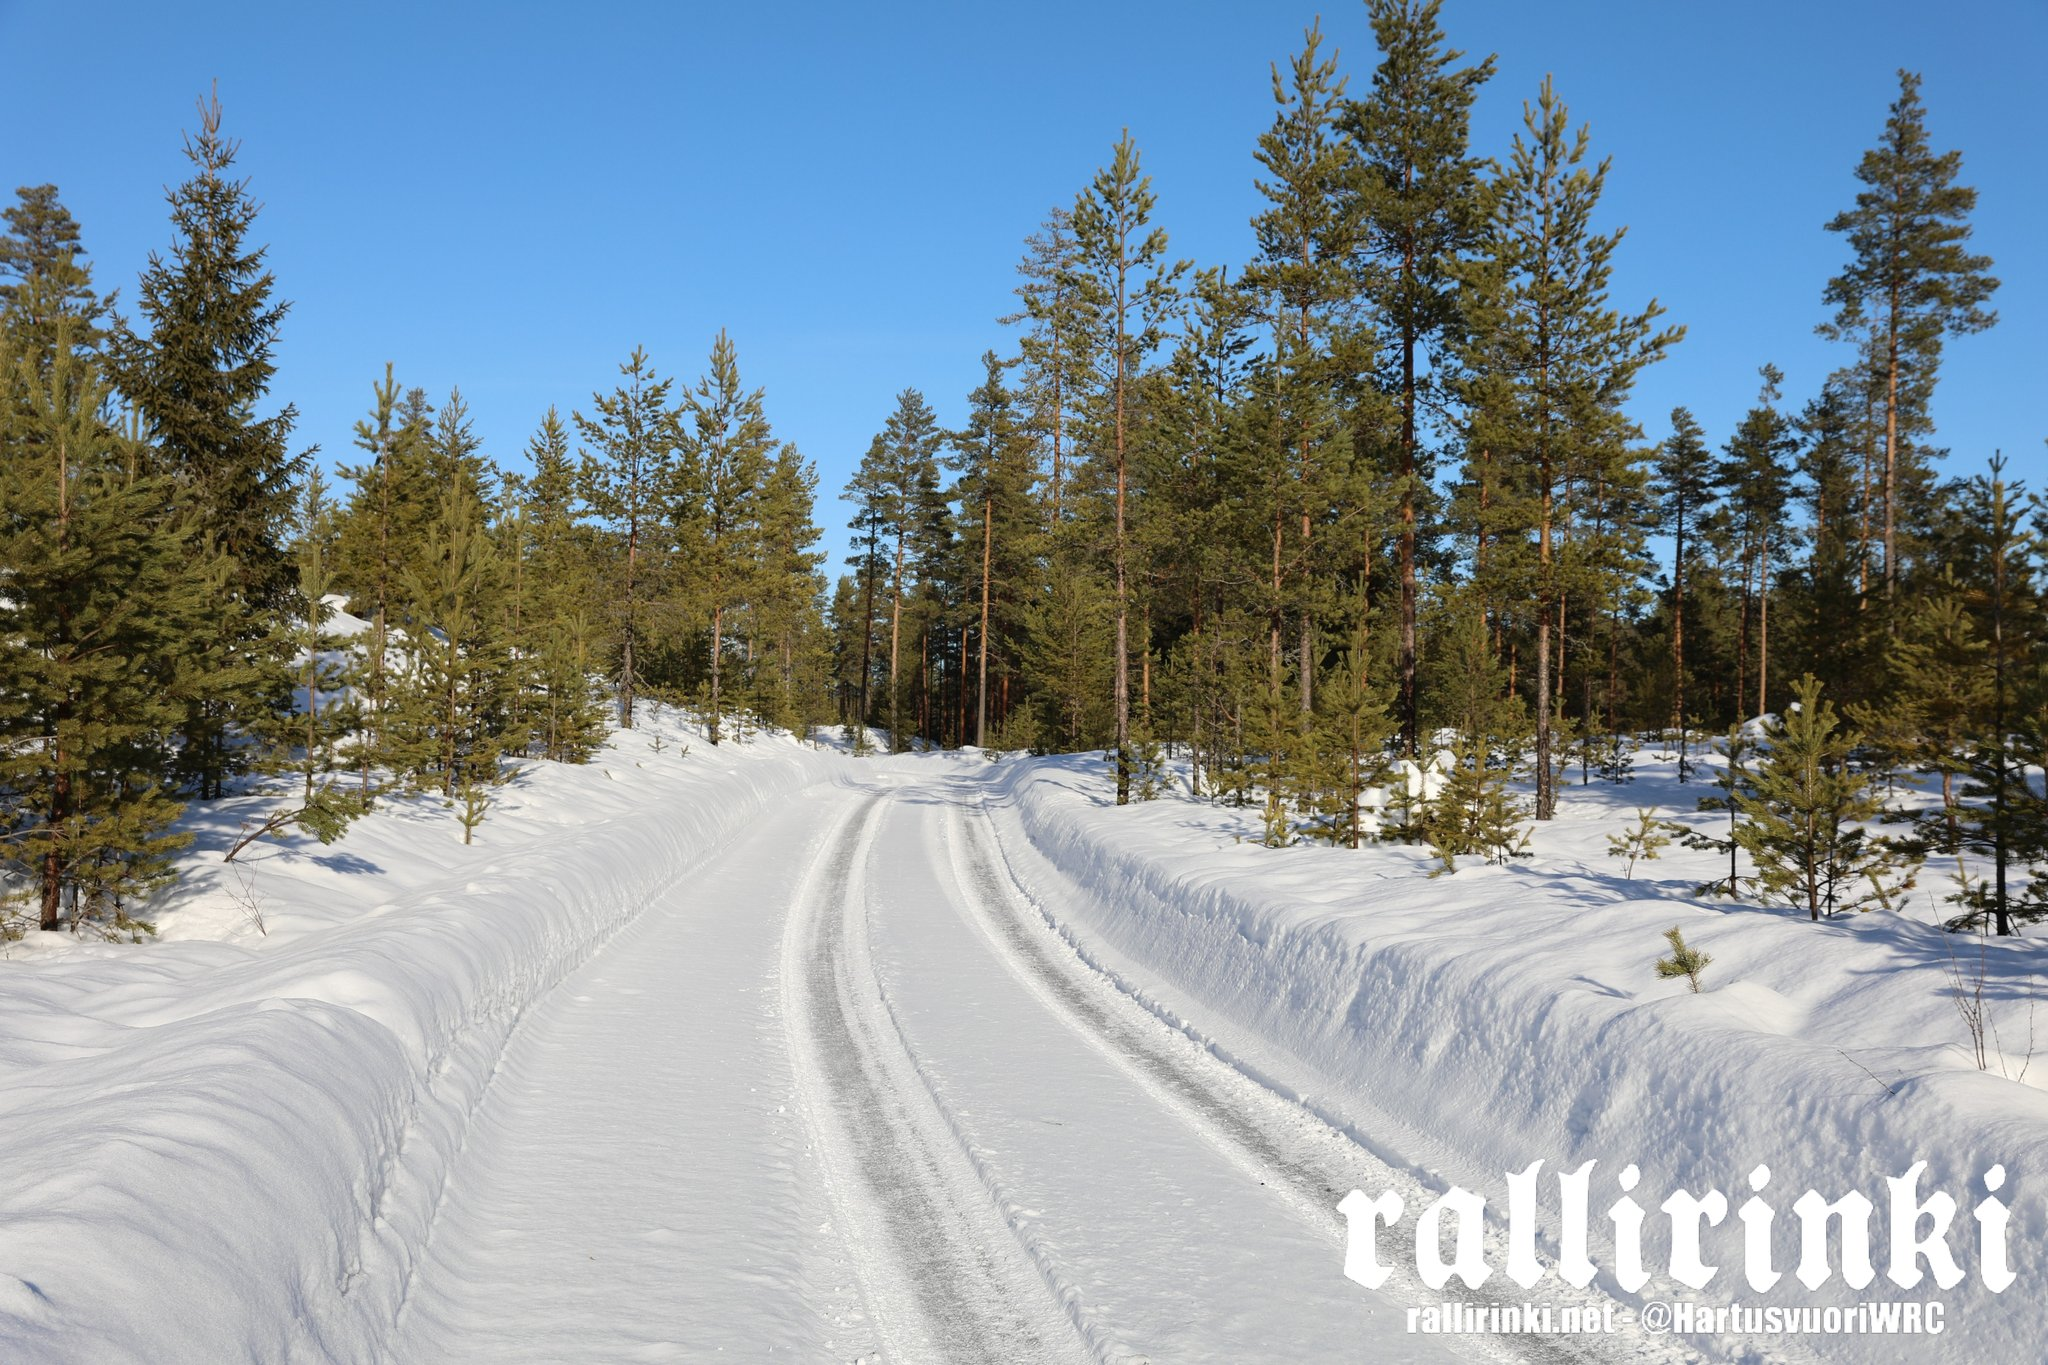 WRC: 67º Rallye Sweden [14-17 Febrero] - Página 2 DzST25UX0AIk8ft